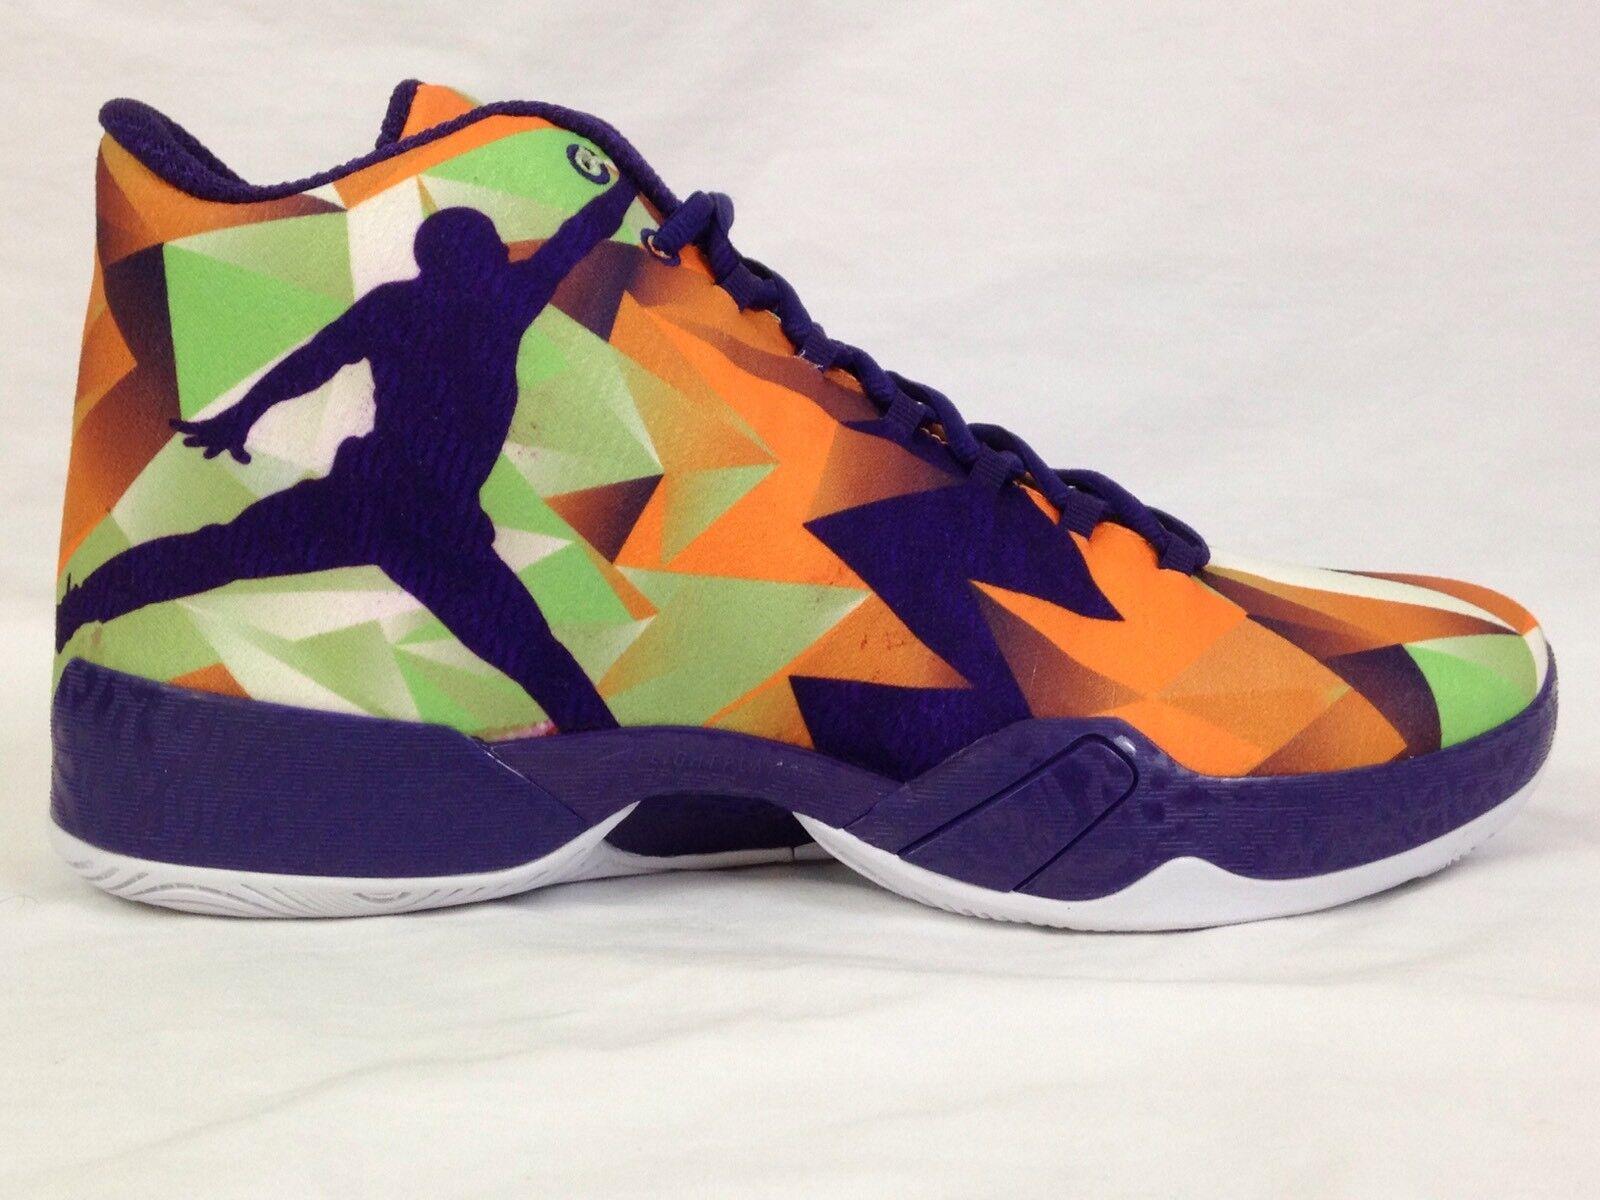 Nike Air Jordan XX9 Mens Shoes 11.5 Mandarin Poison Green Hare Bugs 695515-805 Great discount